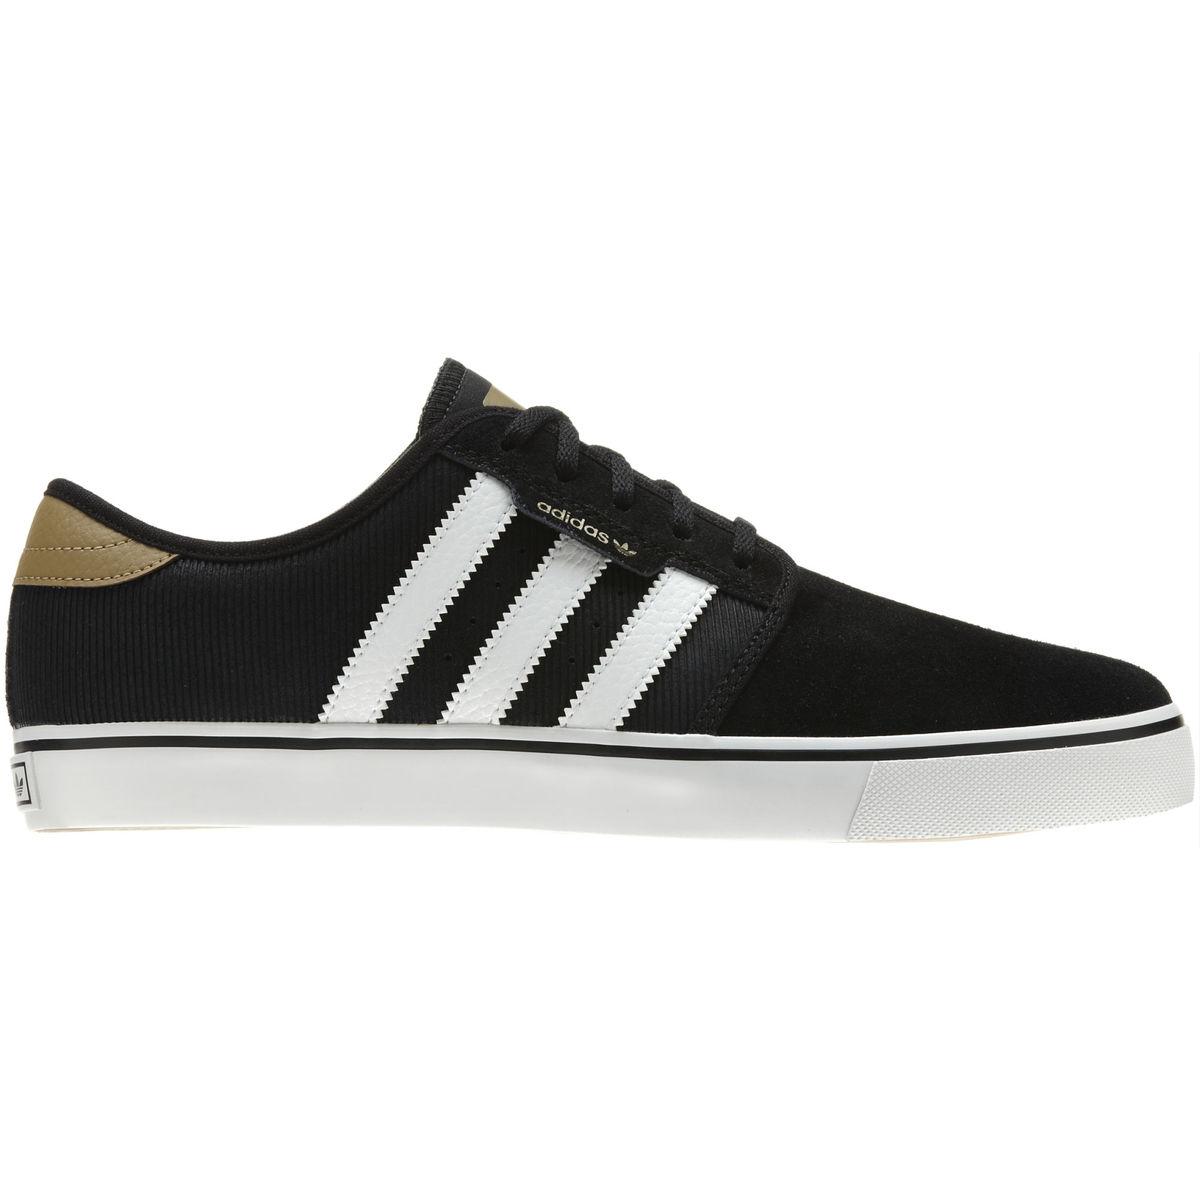 adidas action sports seeley schuhe turnschuhe sneaker herren schwarz ebay. Black Bedroom Furniture Sets. Home Design Ideas